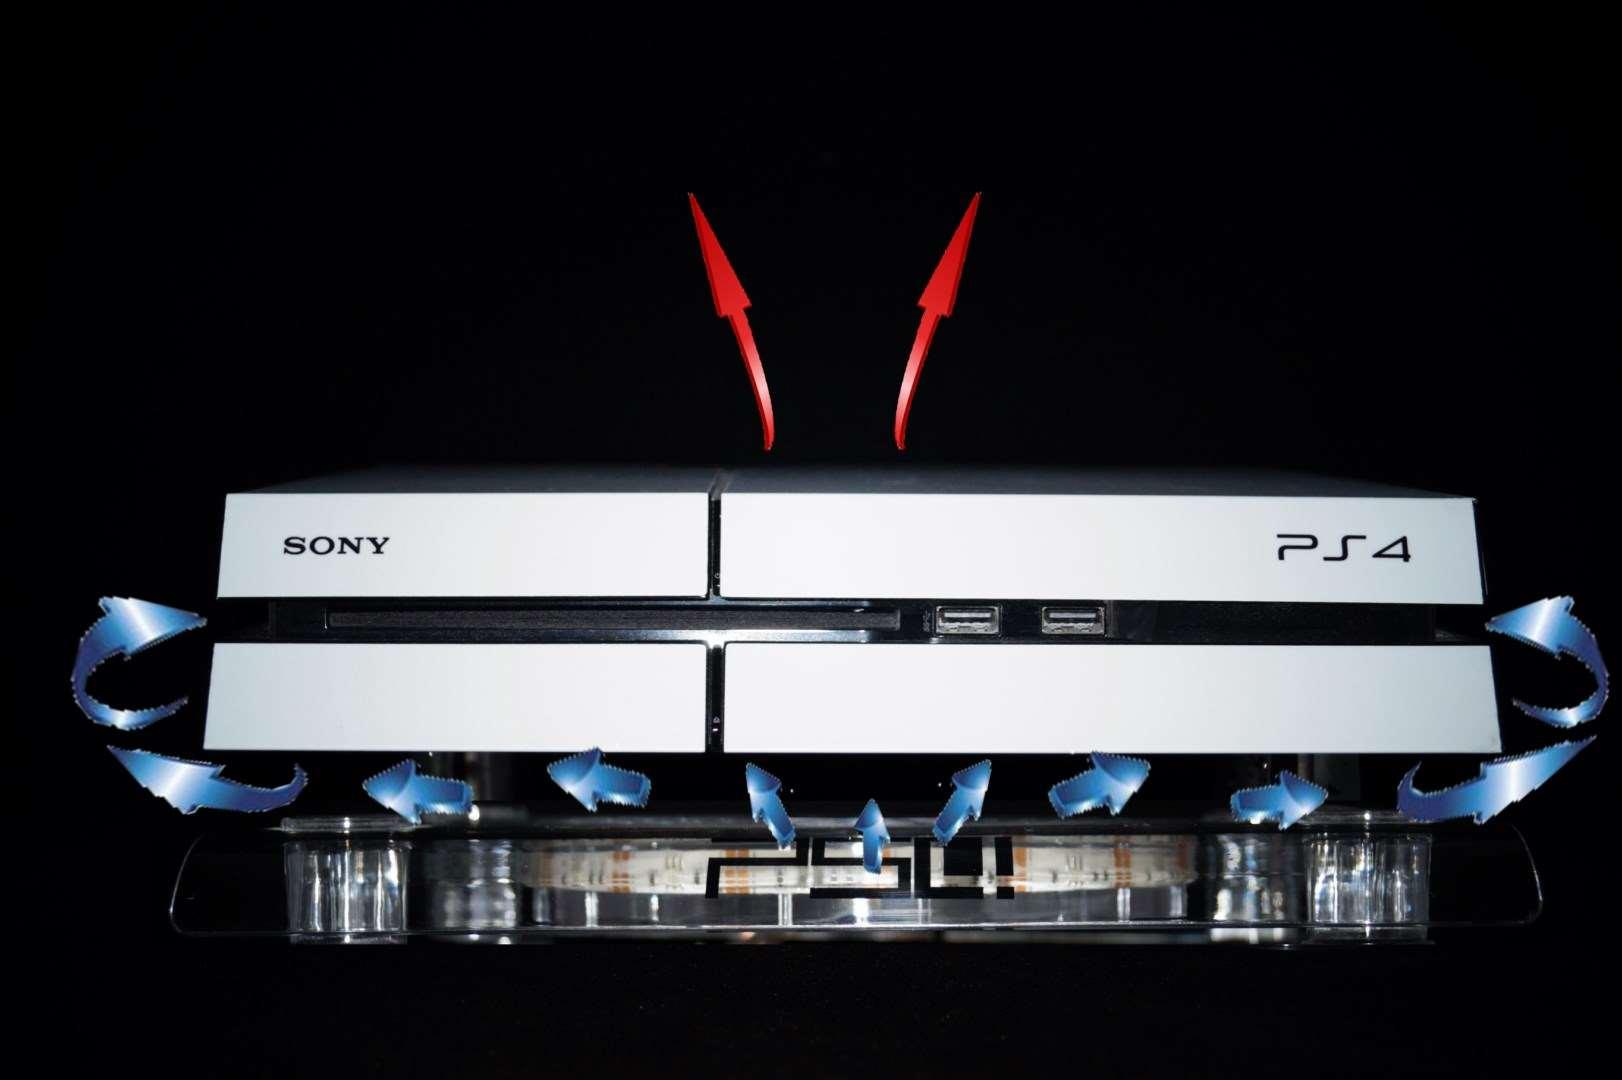 ps4 playstation 4 bundle cod necessario black ops 3 rgb. Black Bedroom Furniture Sets. Home Design Ideas